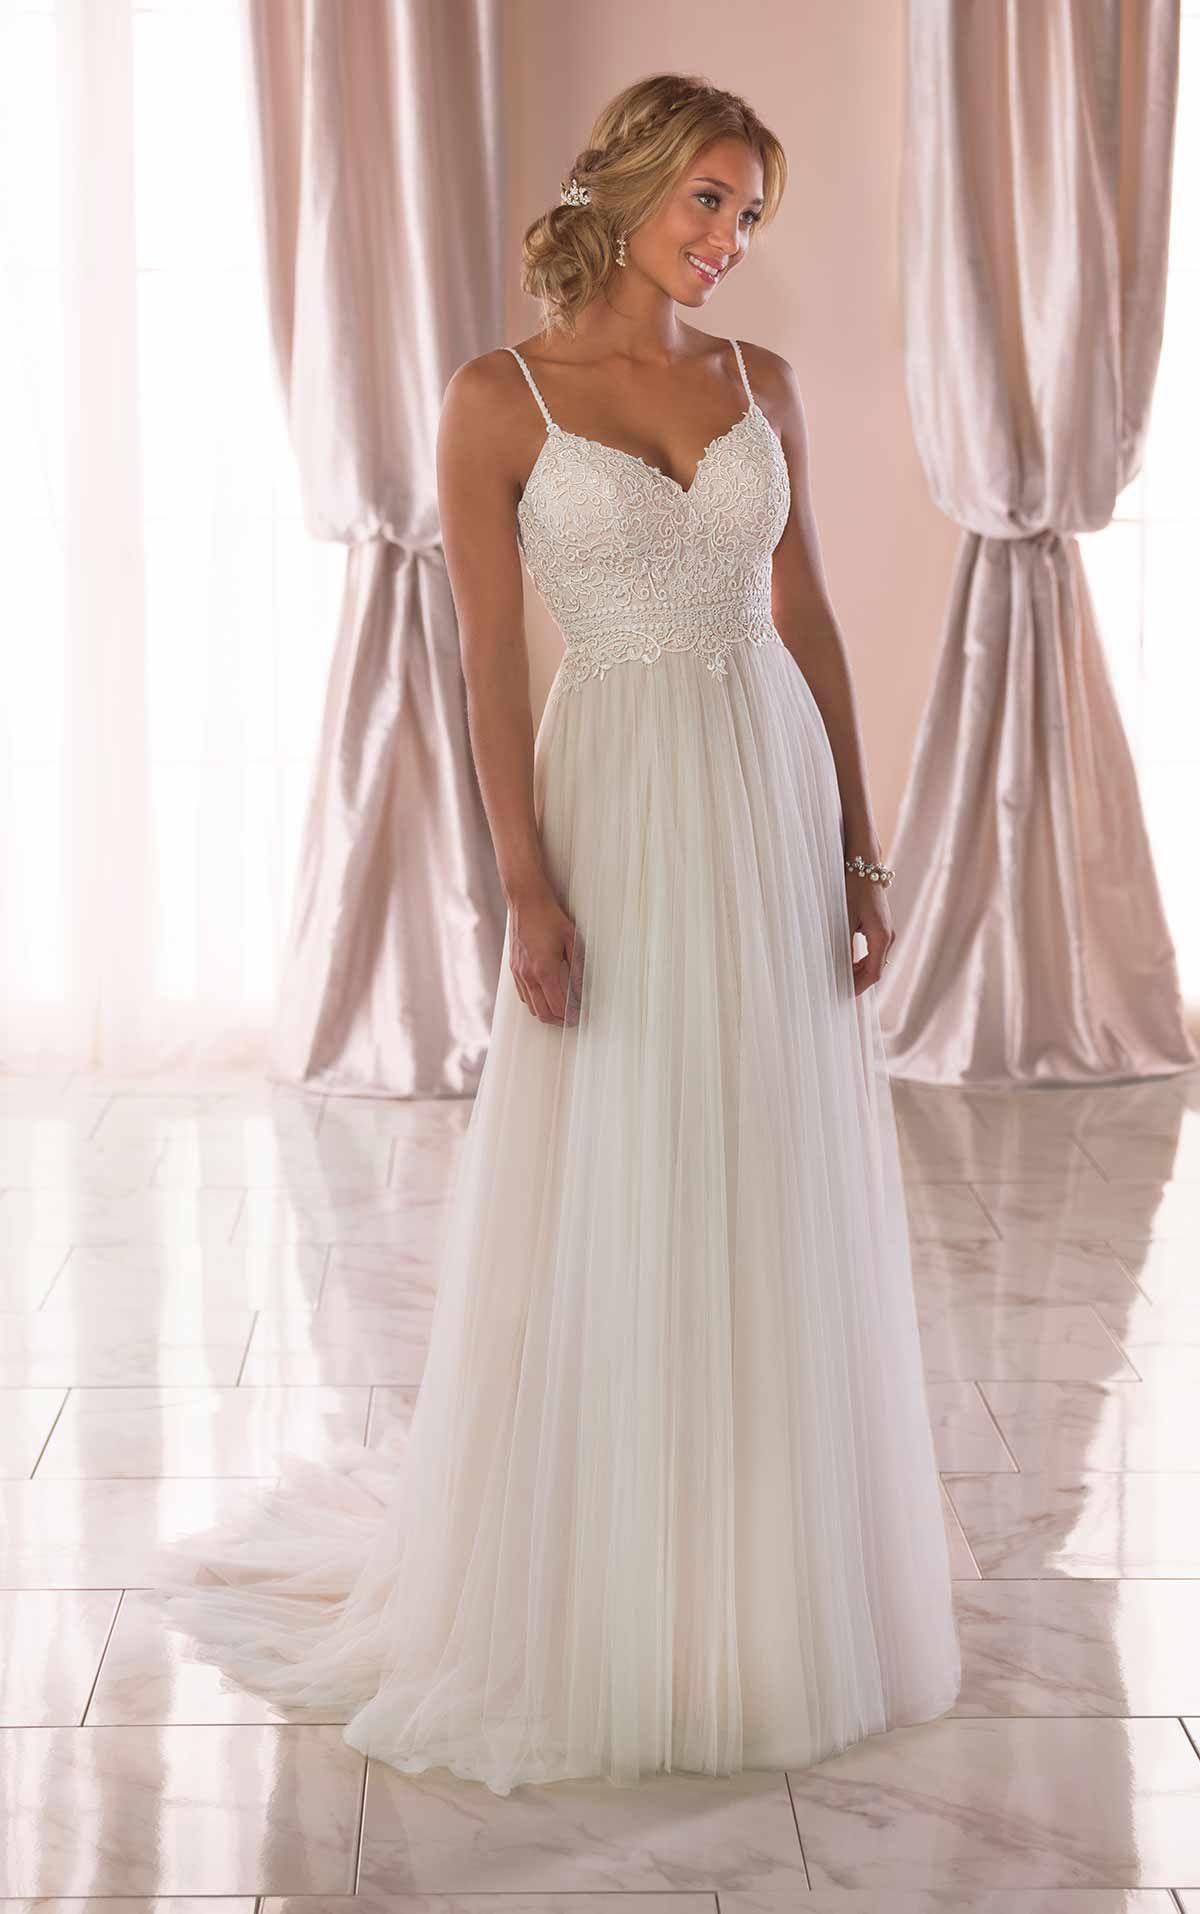 fad274350425 Casual Wedding Dress with Back Detail - Stella York Wedding Dresses 6788